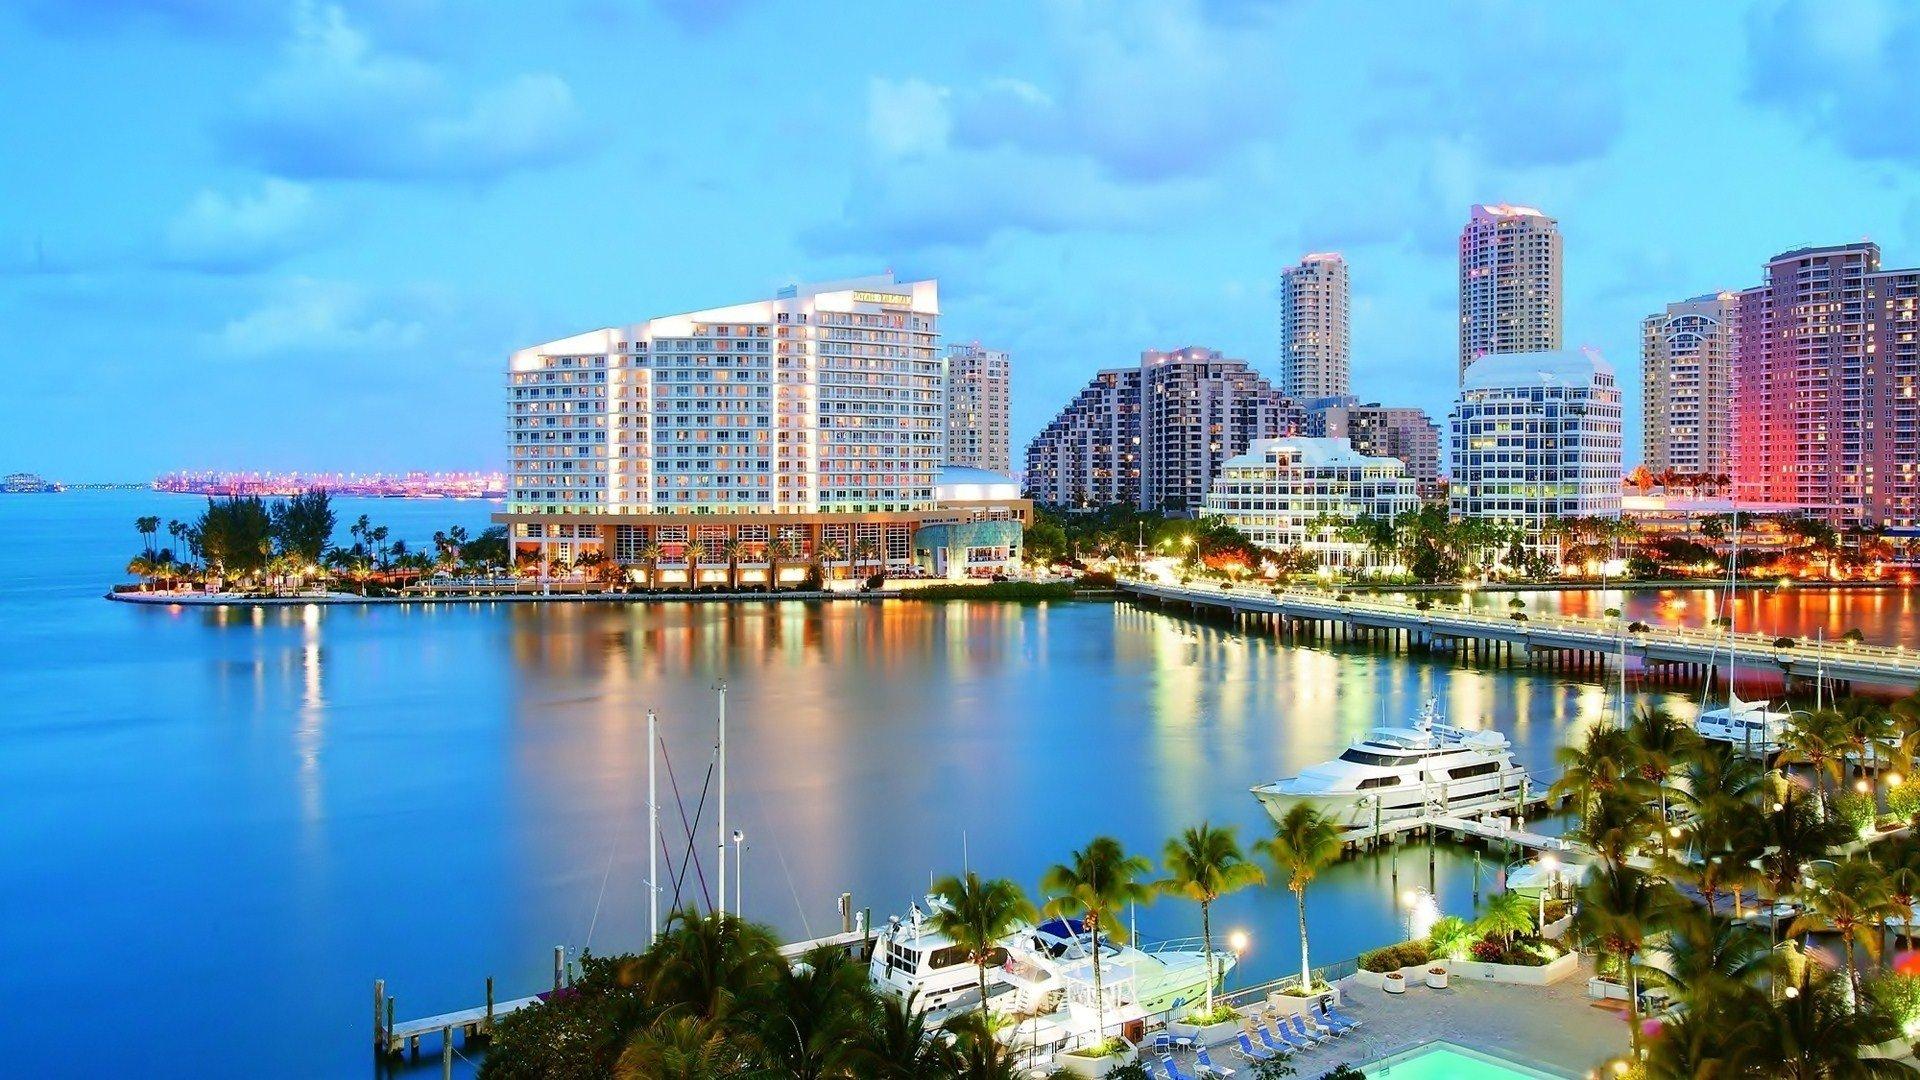 45 Miami Fondos De Pantalla Hd Fondos De Escritorio